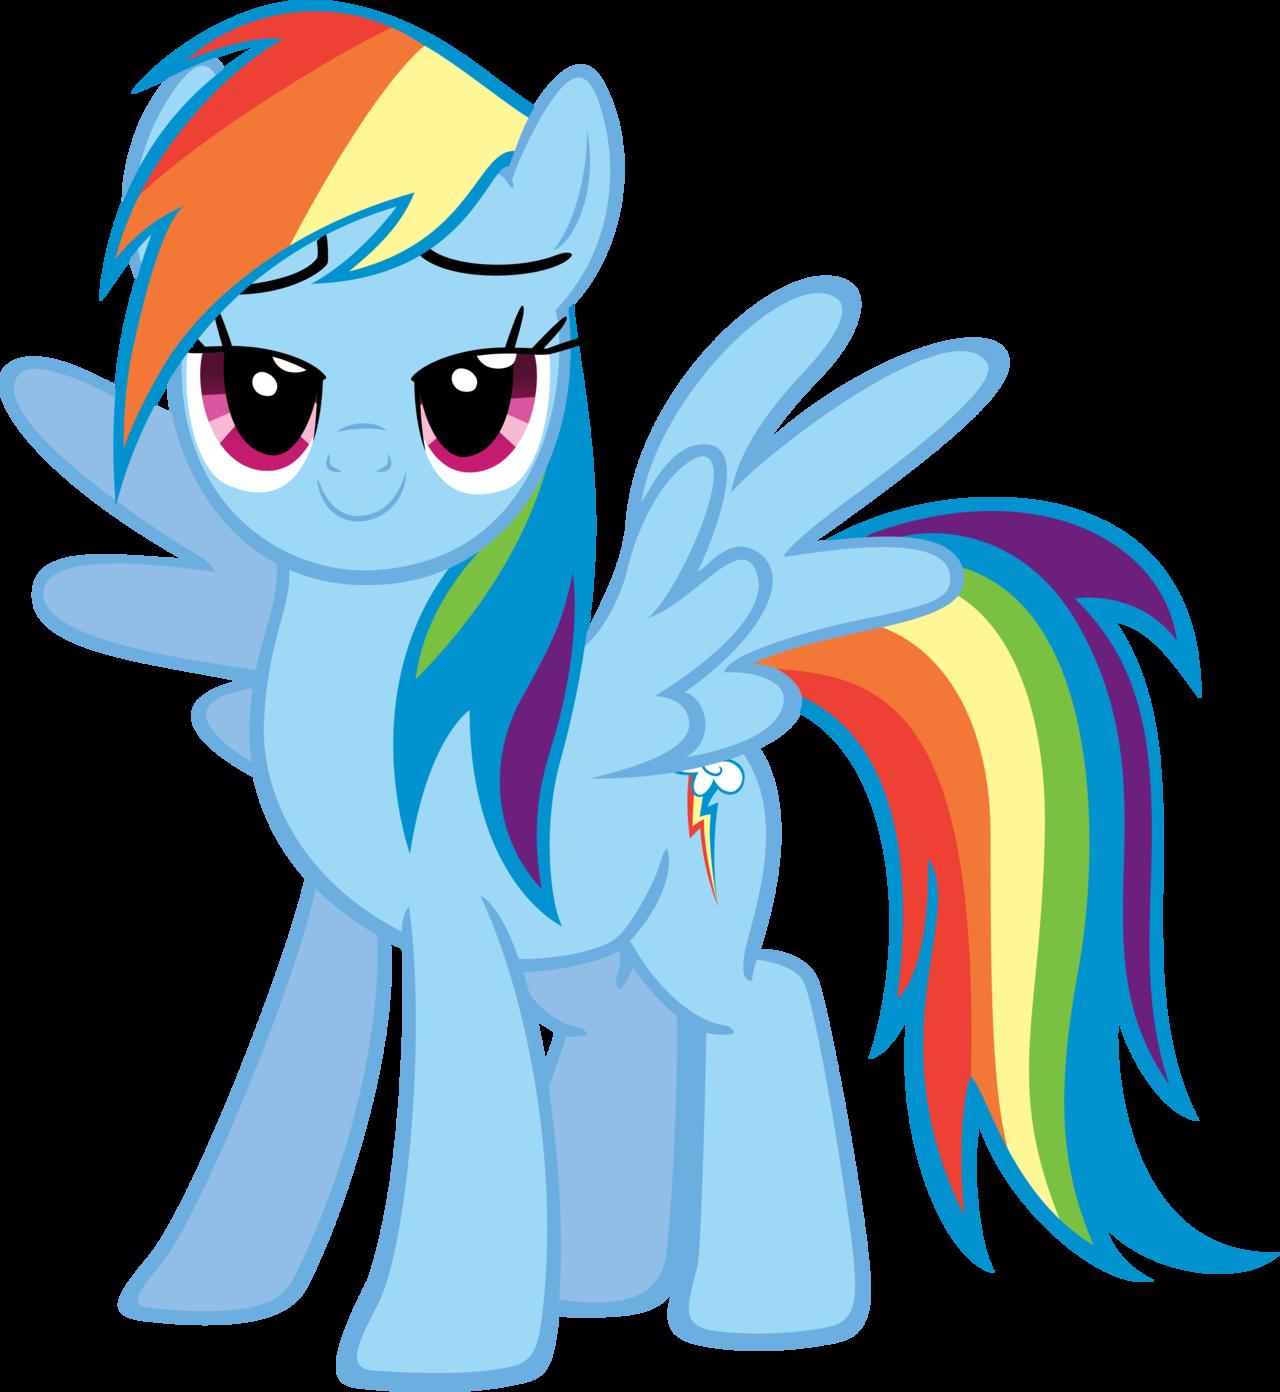 Rainbow Dash Png Image - Happy r...